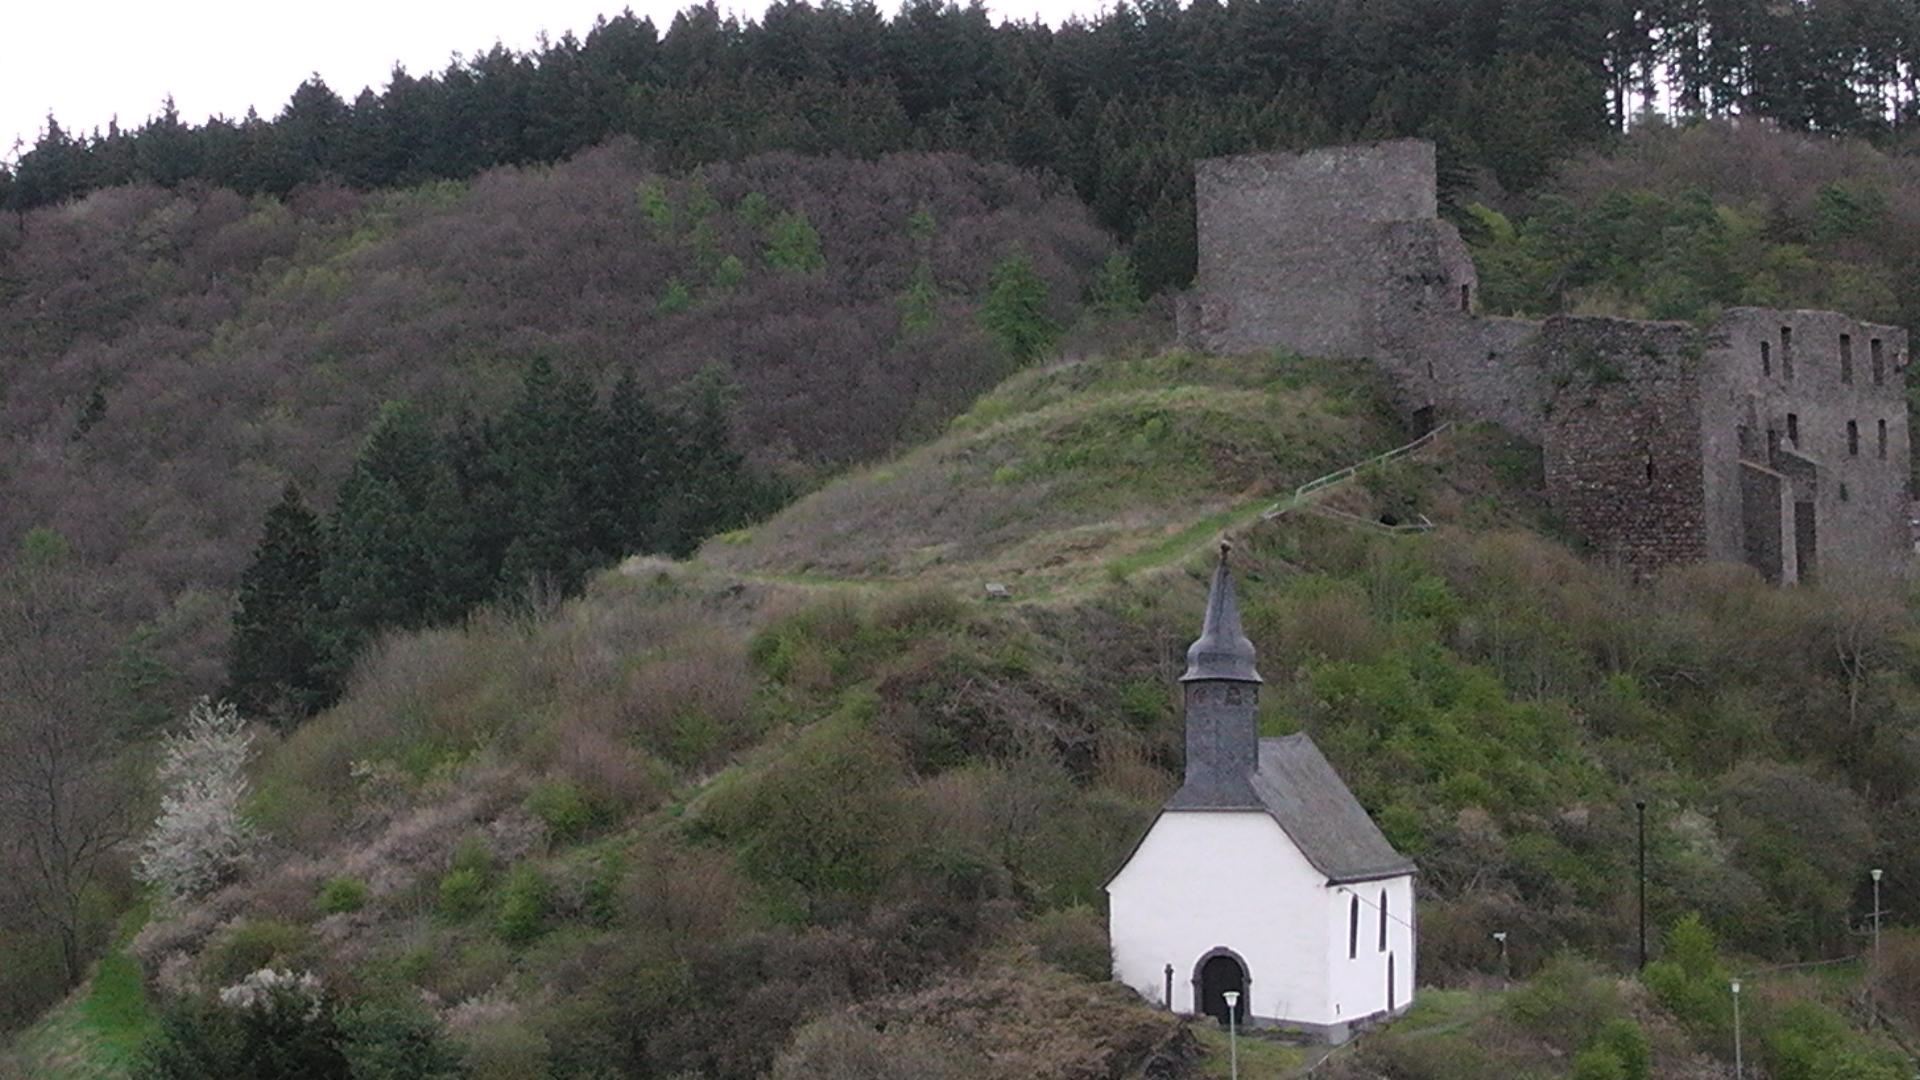 106-blick-auf-die-ruine-virneburg